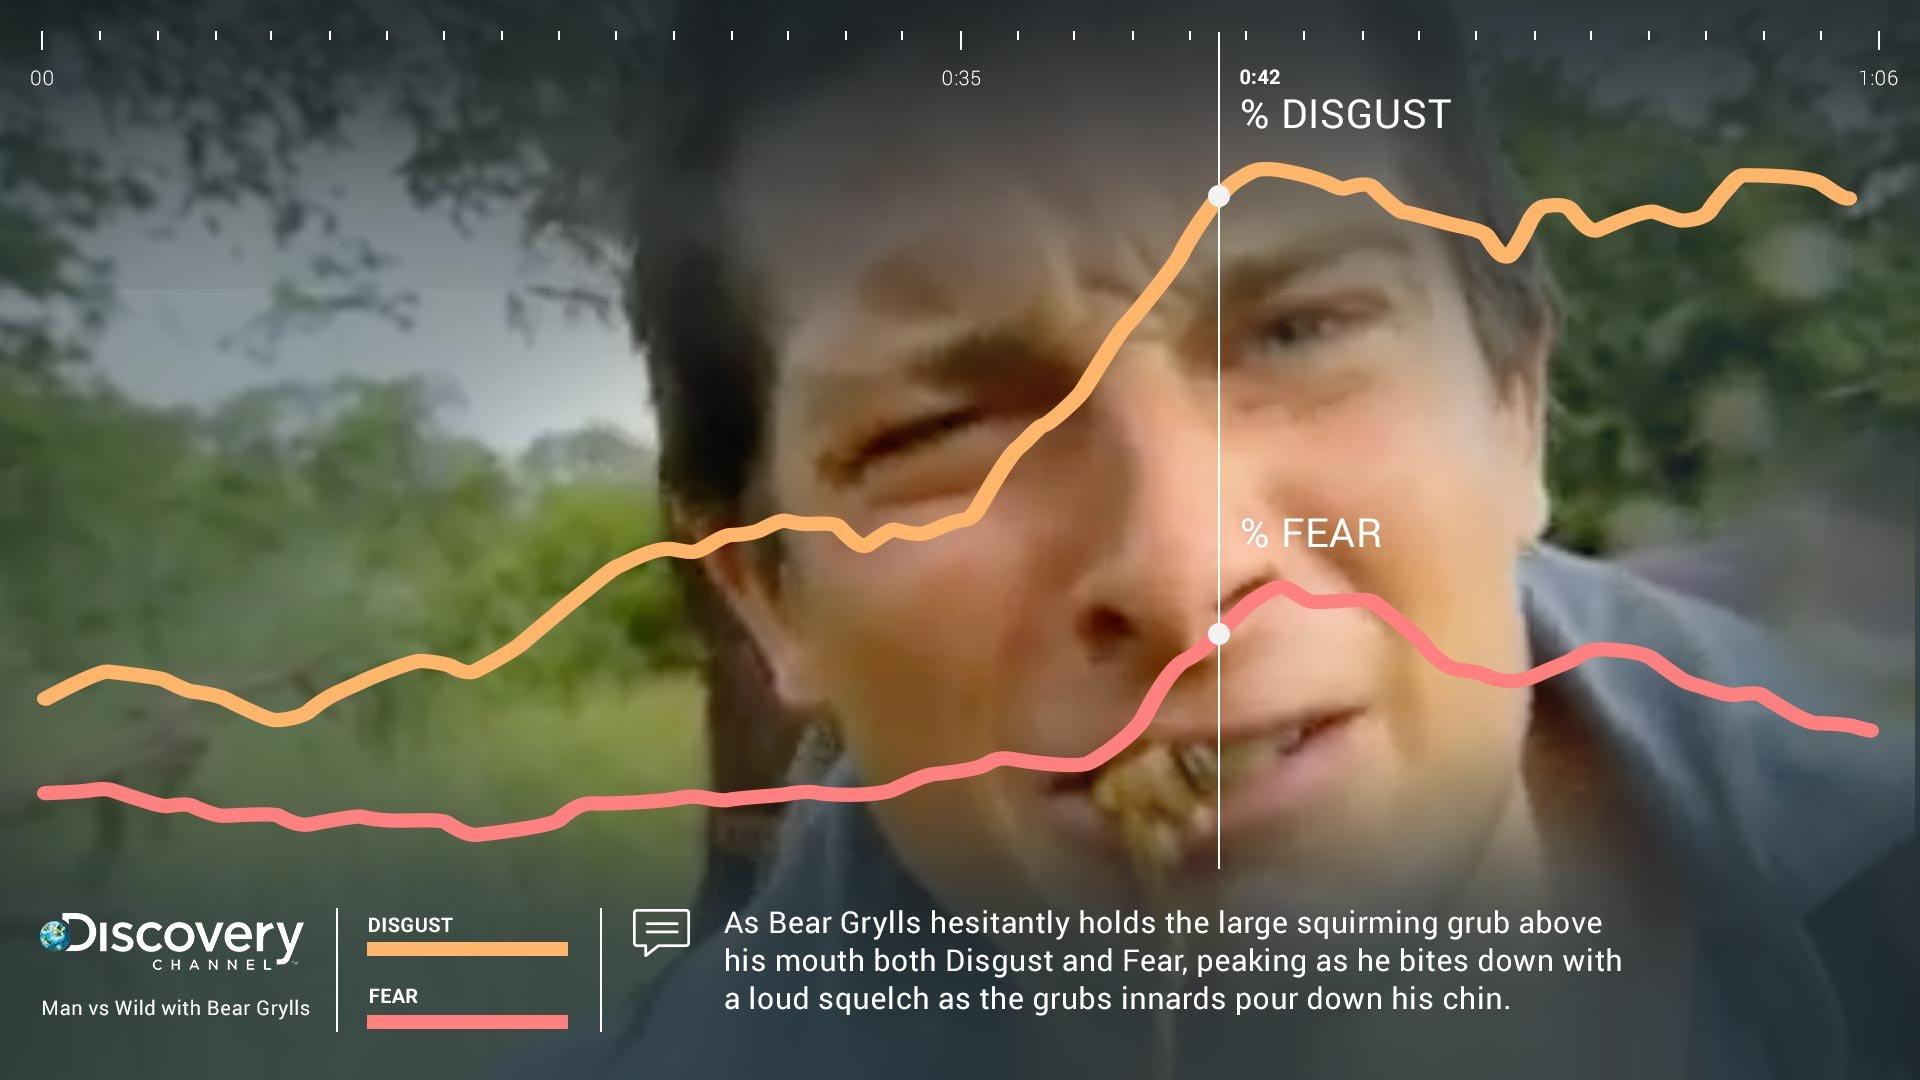 BearGrylls_Man_vs_Wild